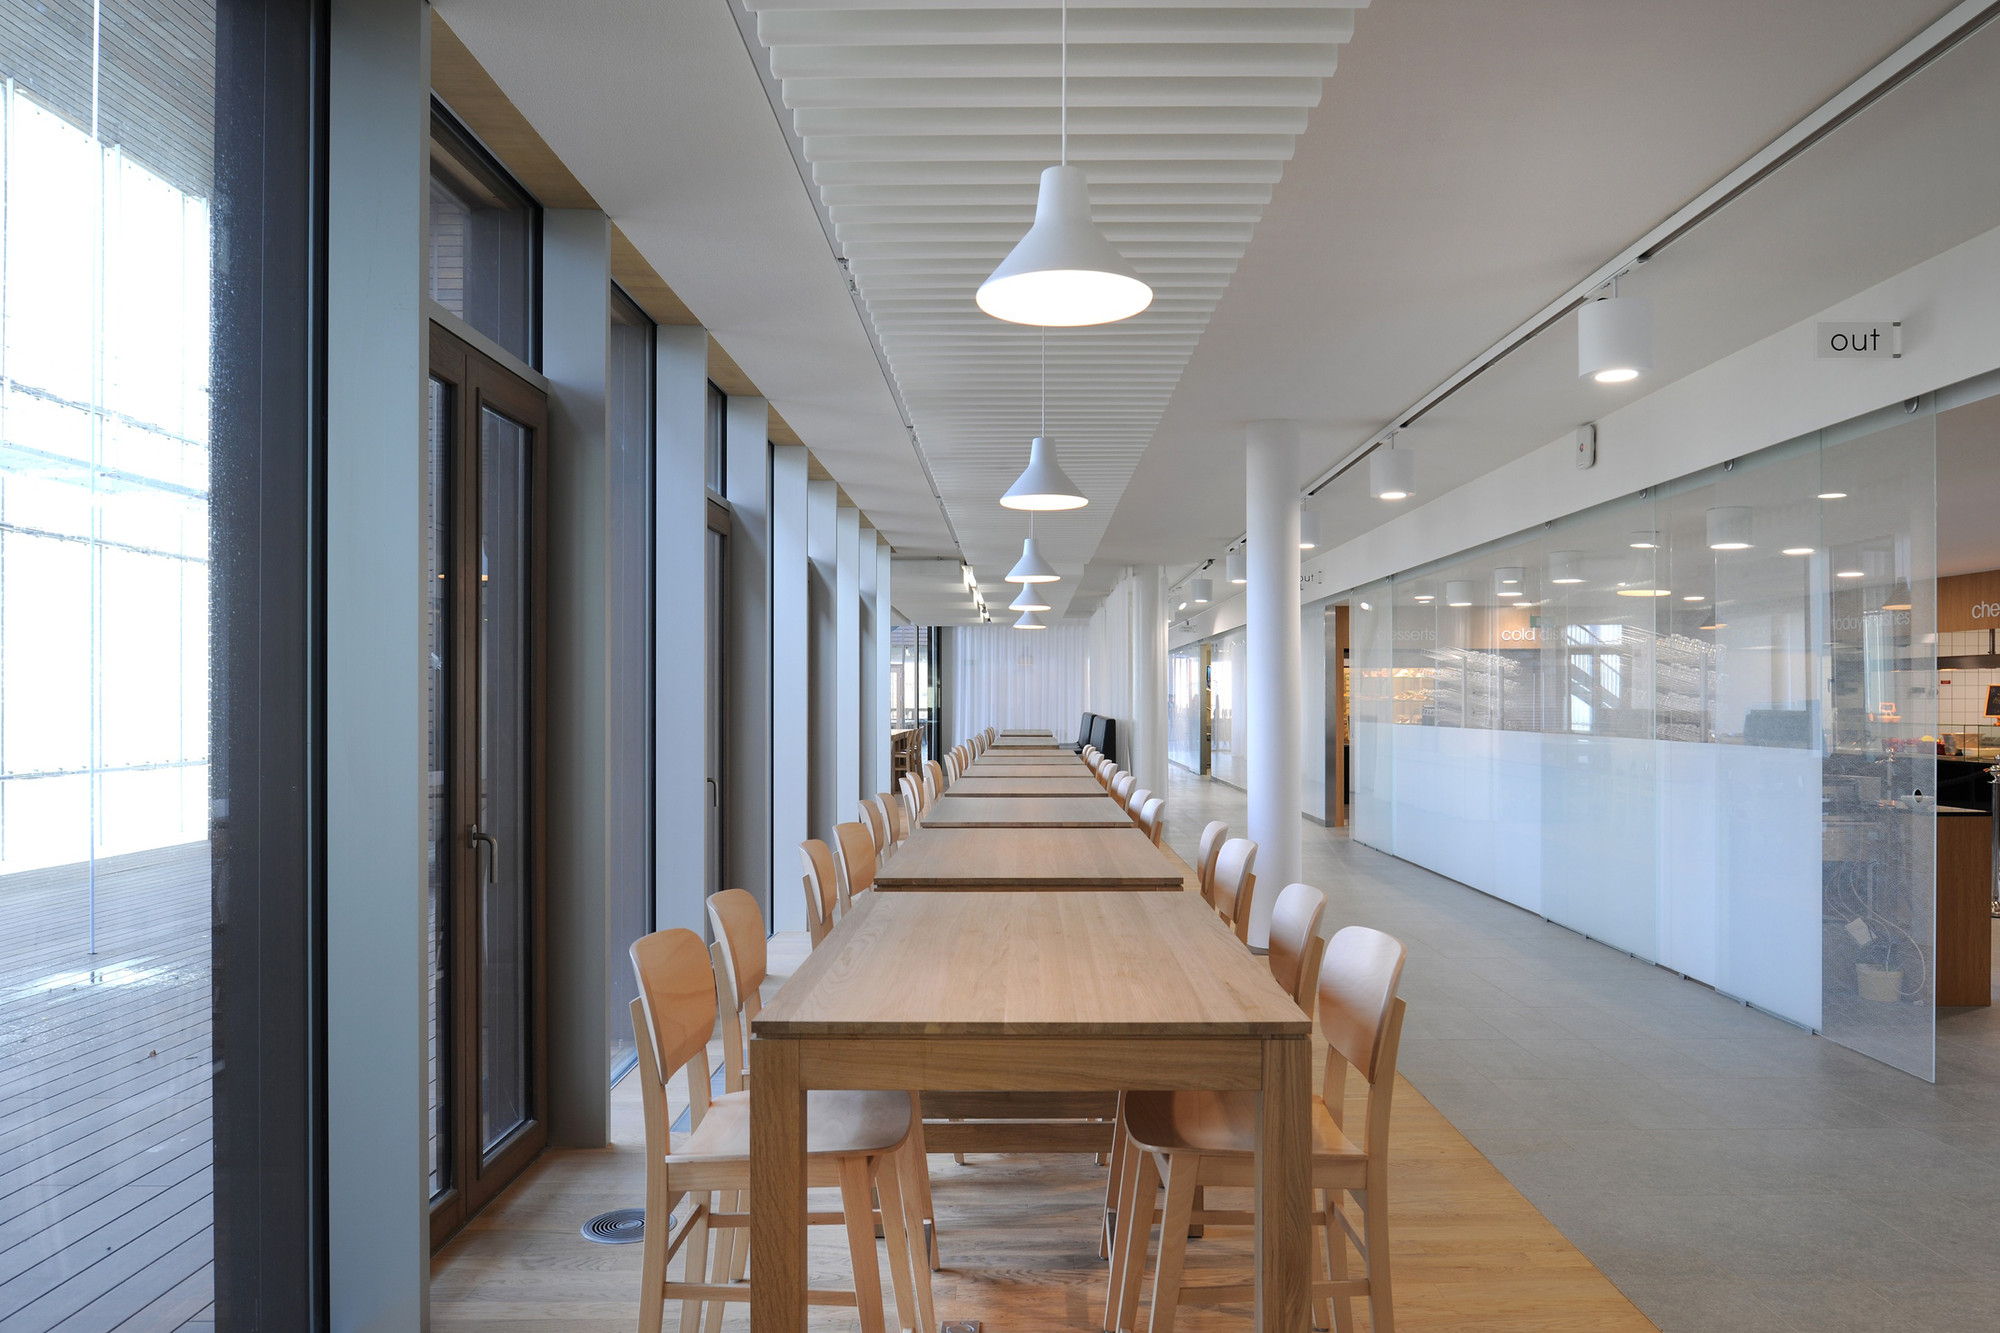 galeria de escrit rio sede da agc glass europe samyn and partners 11. Black Bedroom Furniture Sets. Home Design Ideas